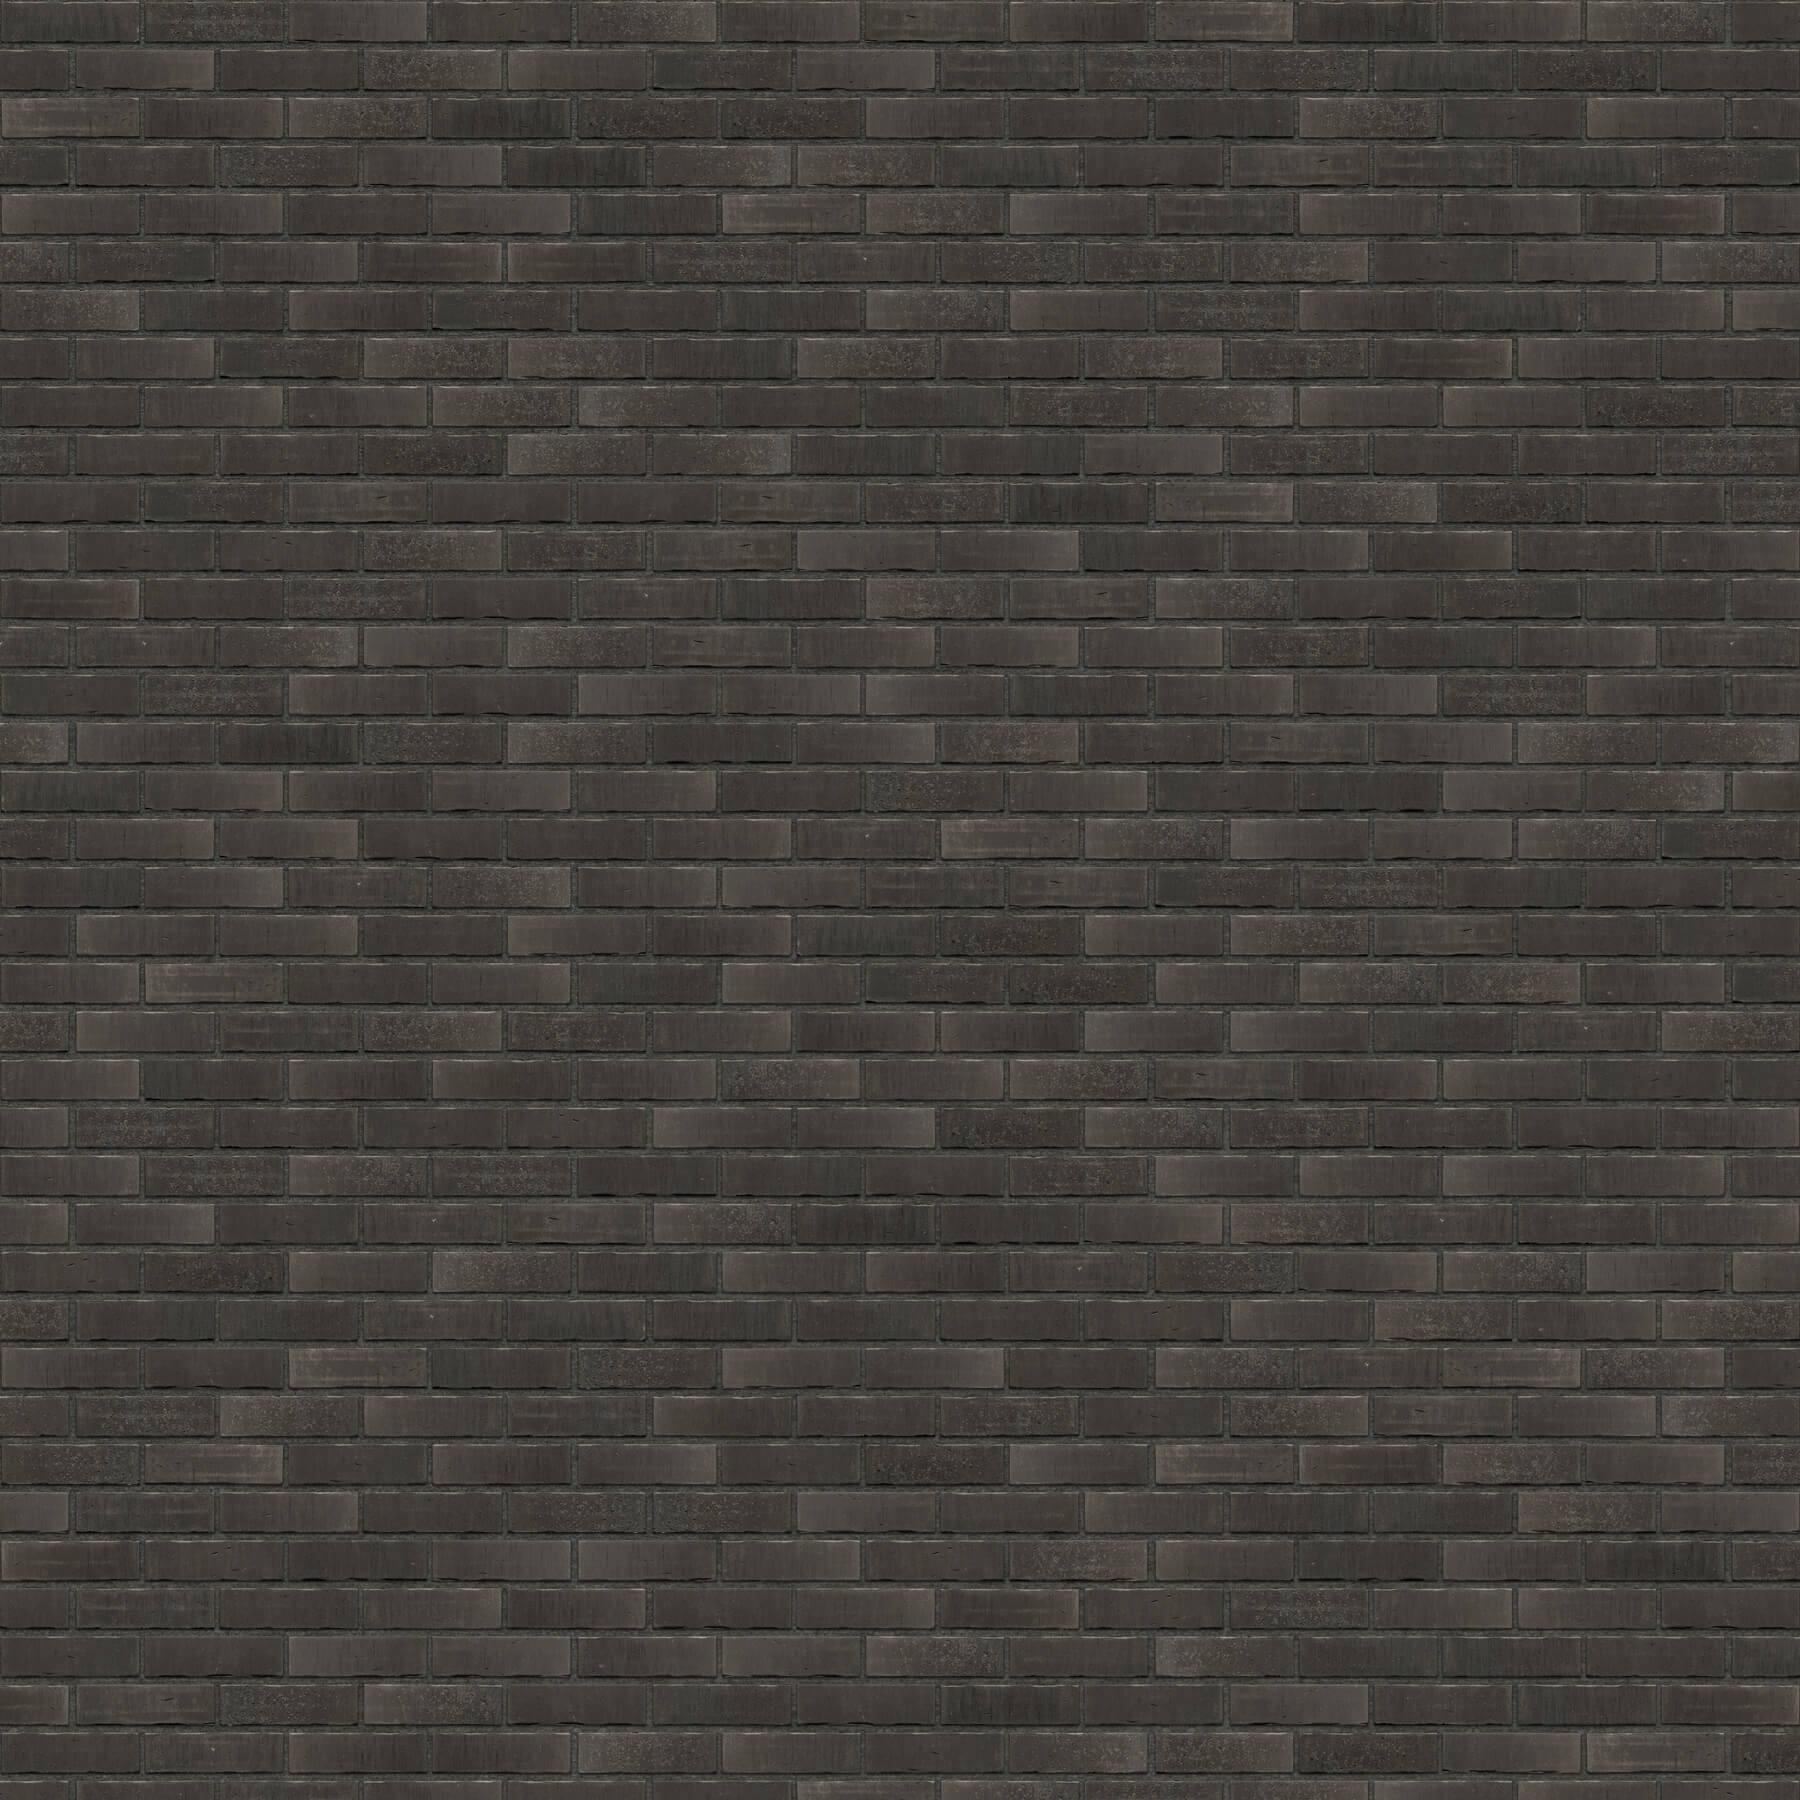 Dekorativna cigla listela FeldHaus Klinker r-736 nf Antracit Fuga